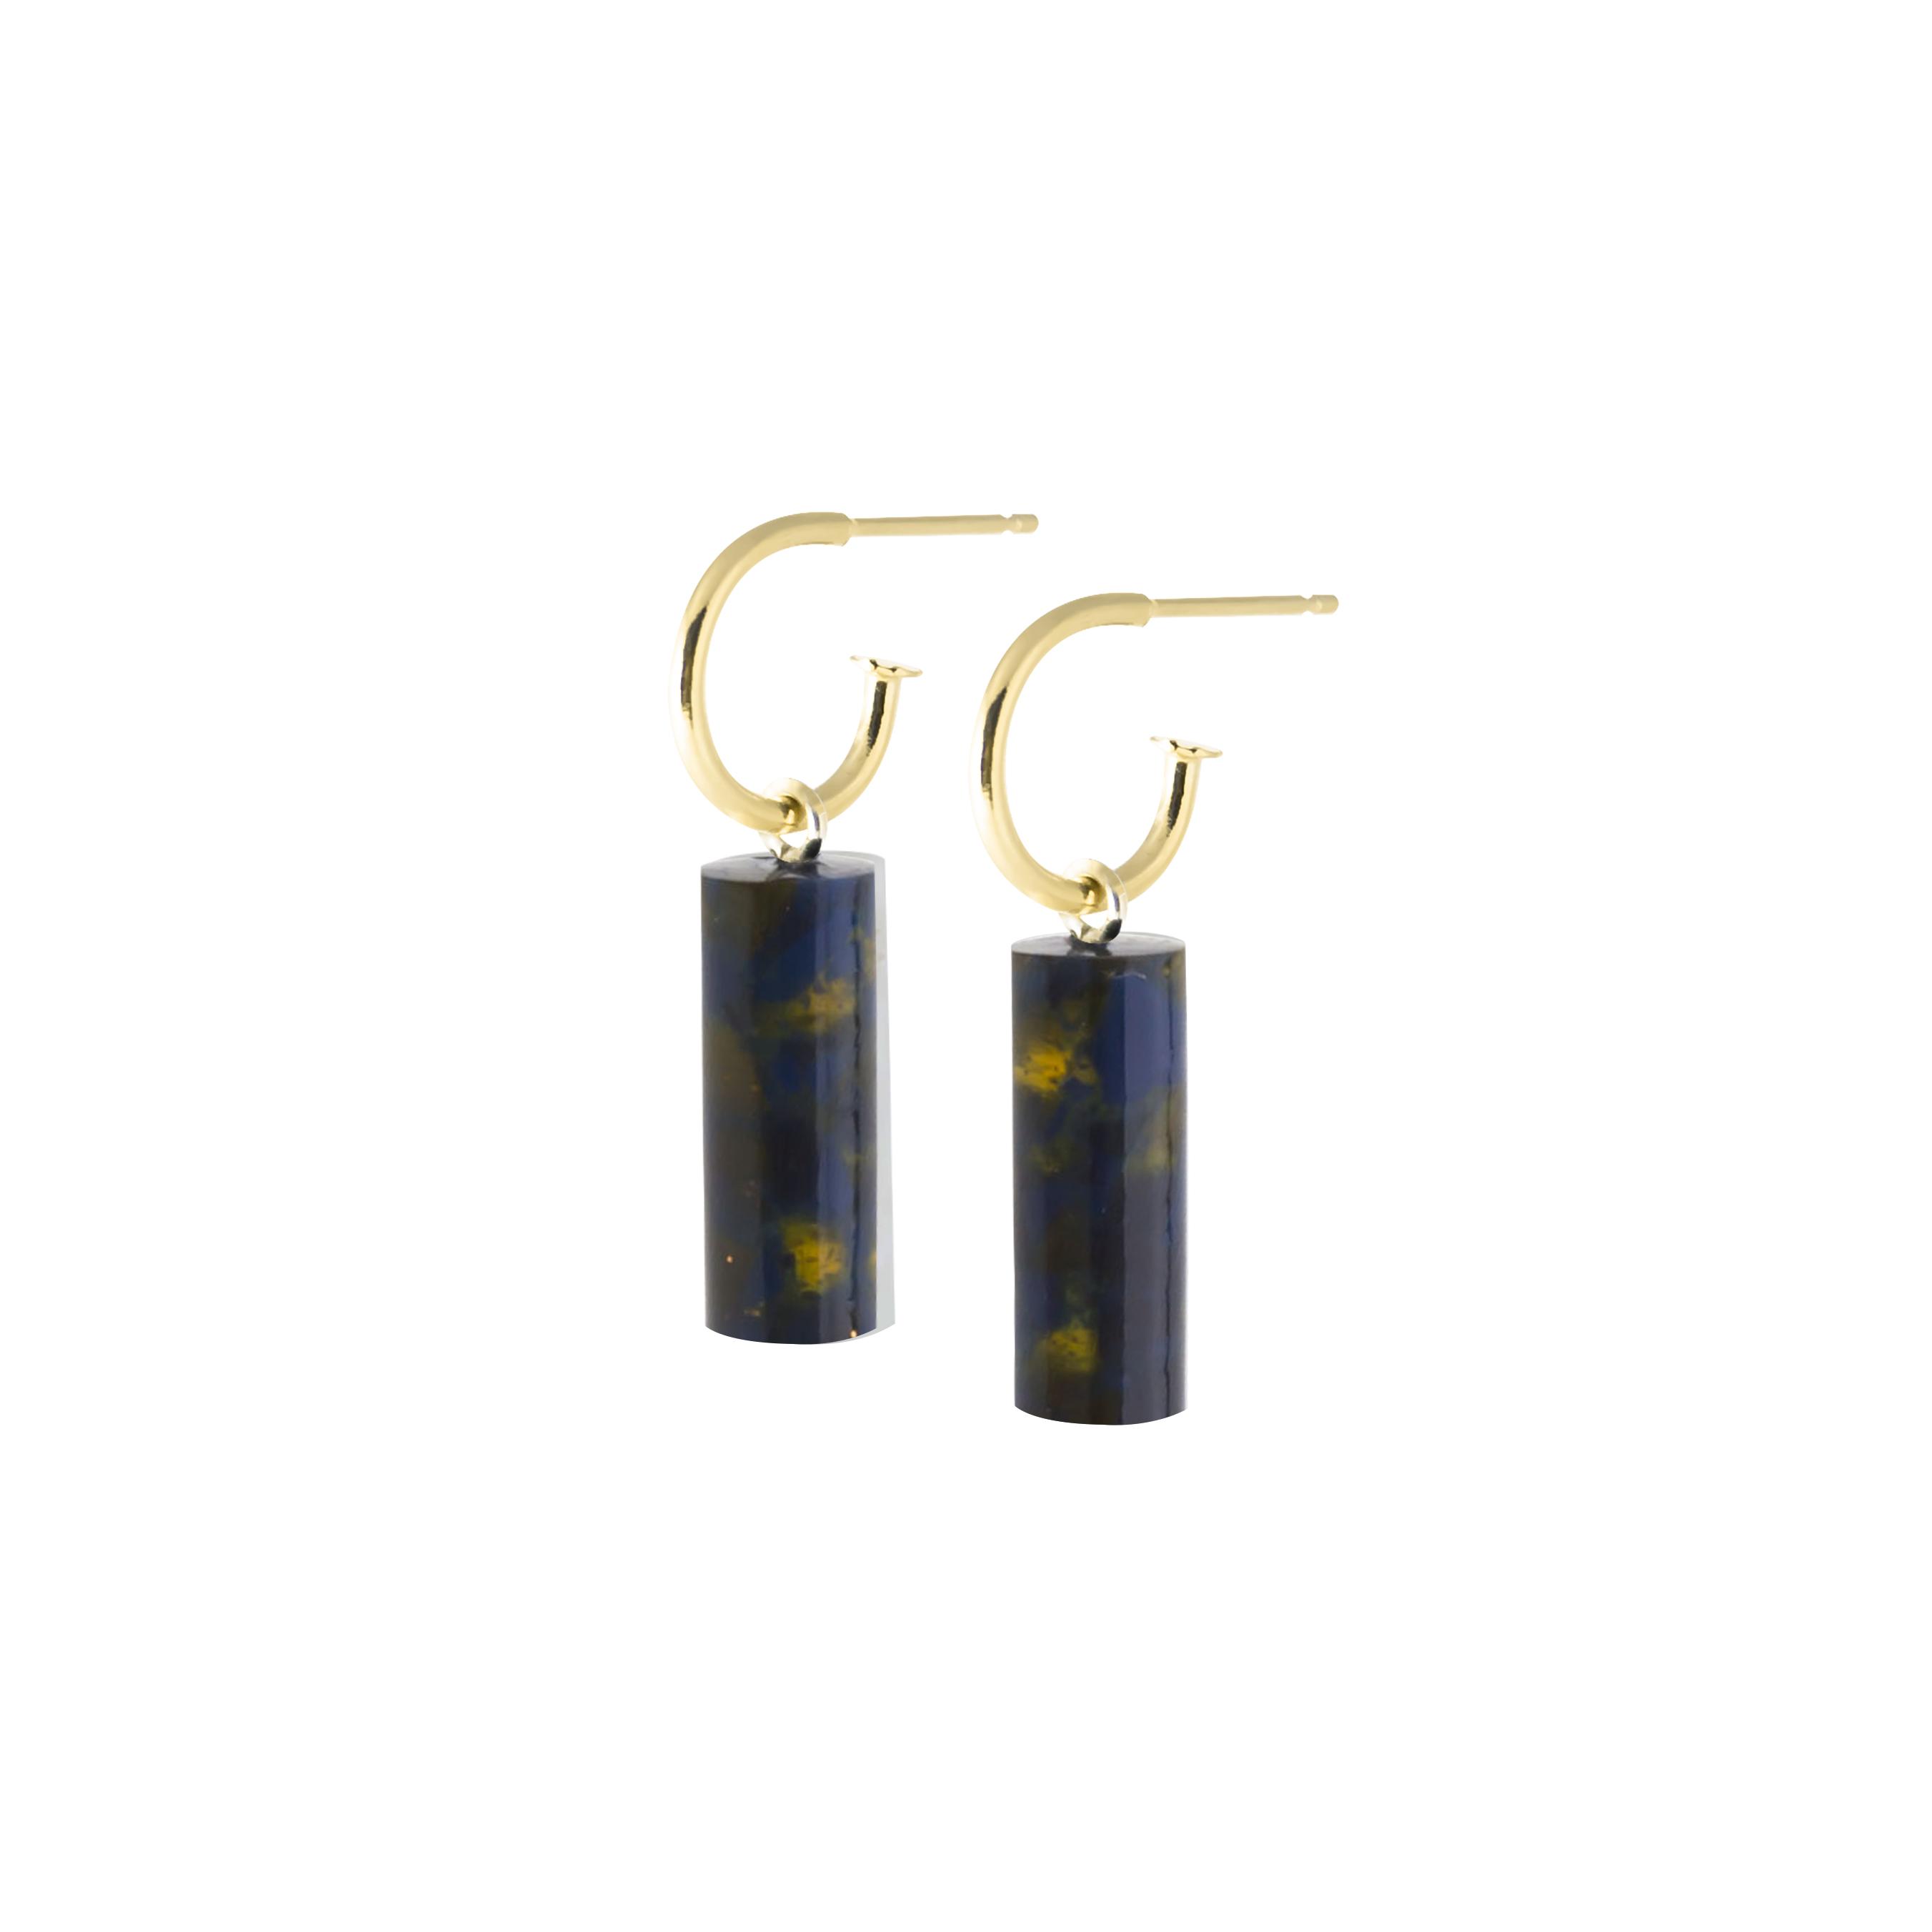 oorbel staaf kort-blackishyellow-geel